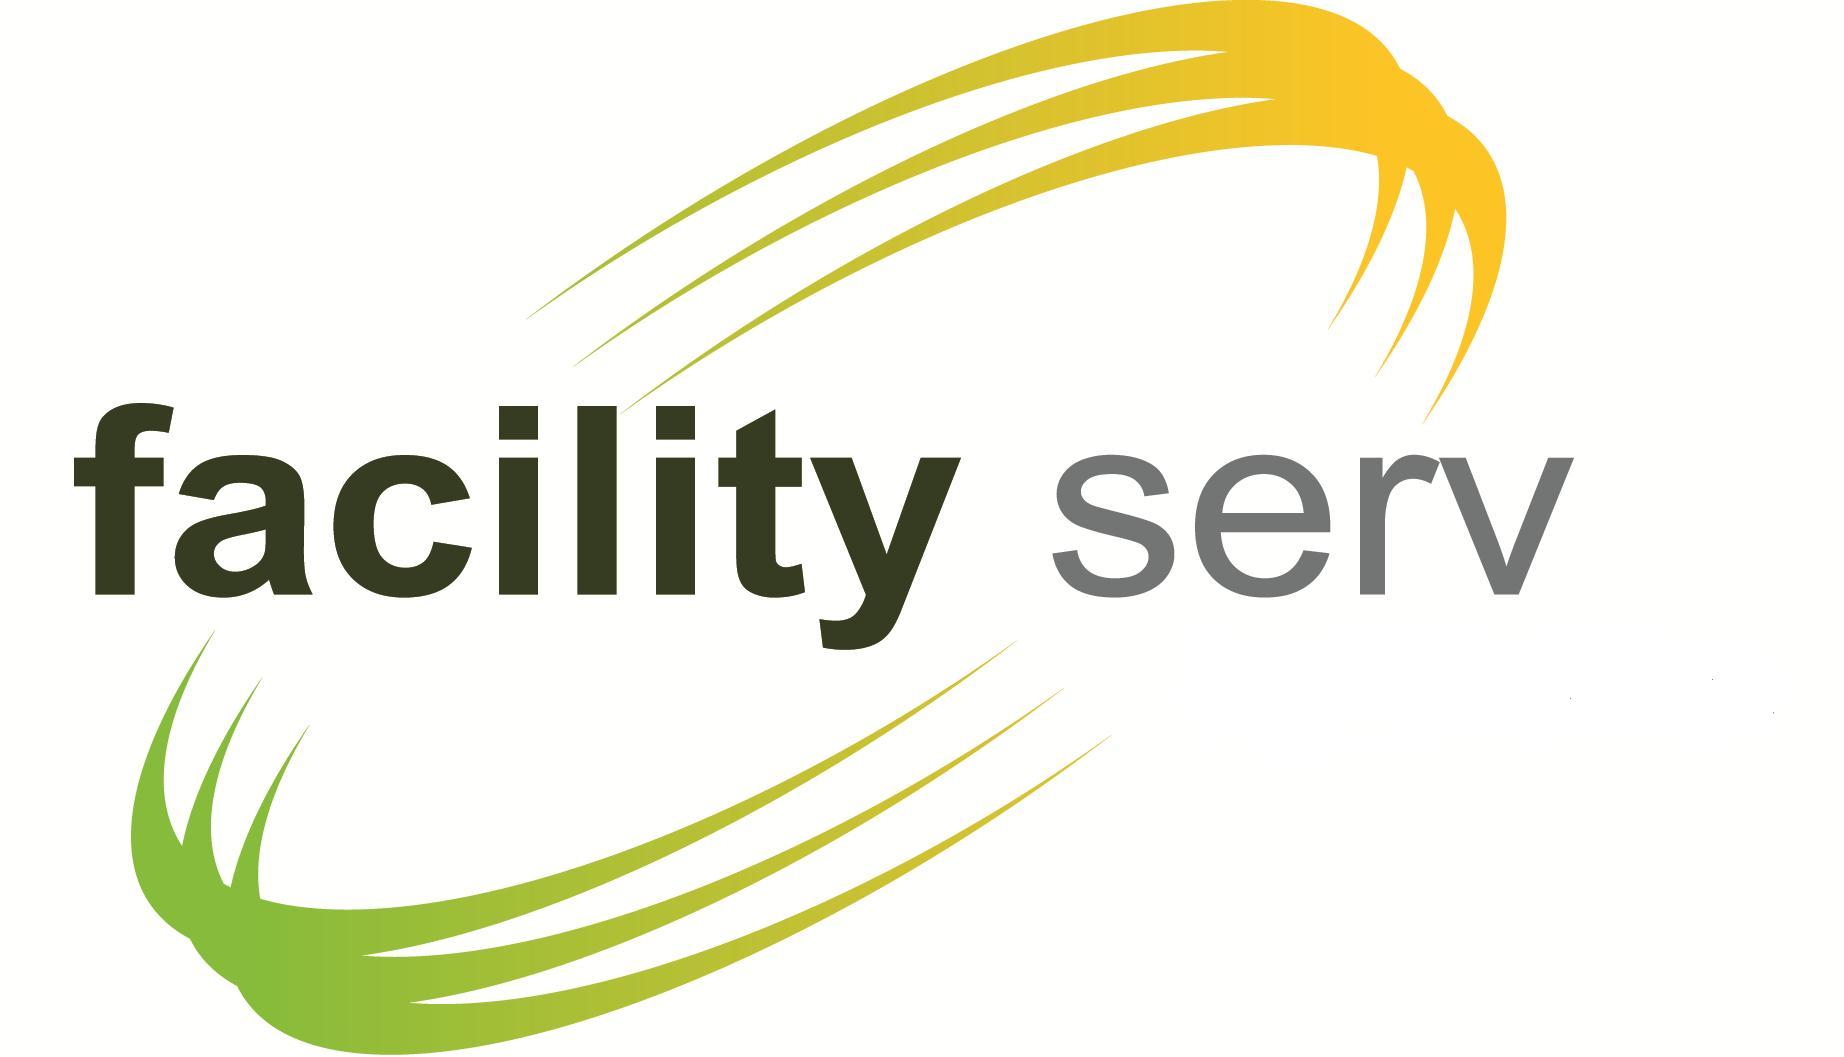 Facility Serv'